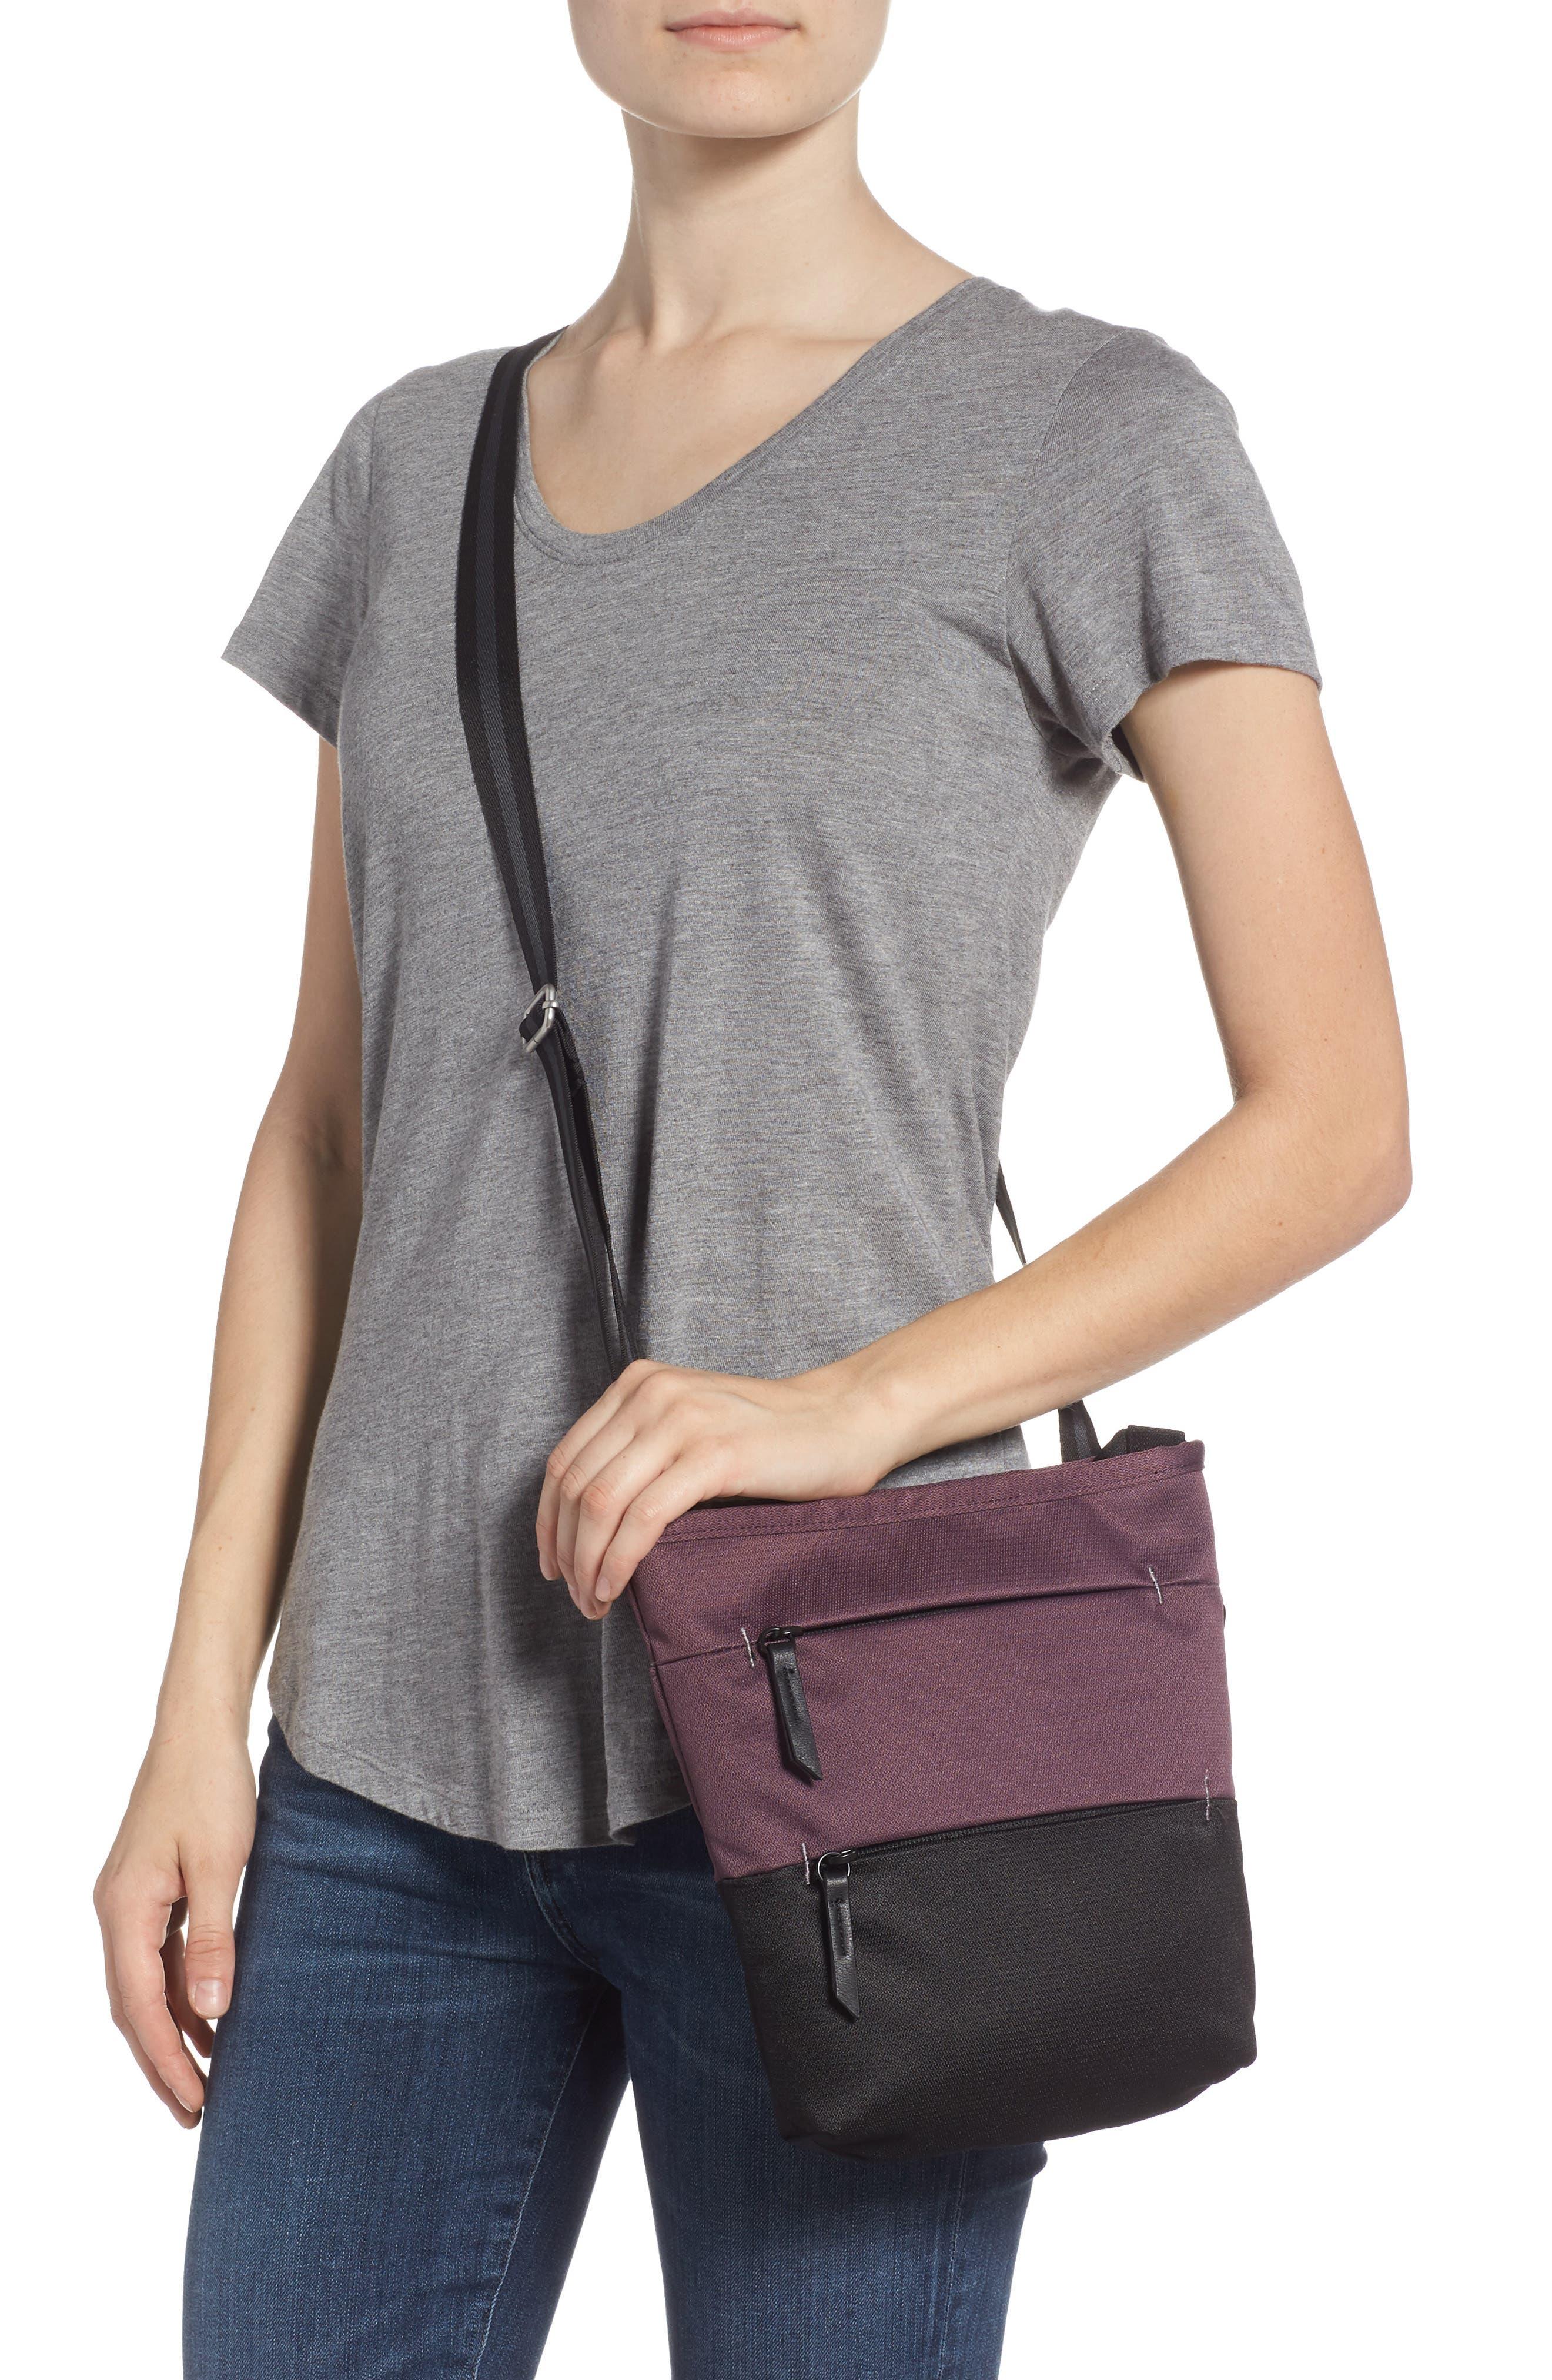 Sadie Medium RFID Crossbody Bag,                             Alternate thumbnail 2, color,                             PURPLE DAHLIA/ BLACK